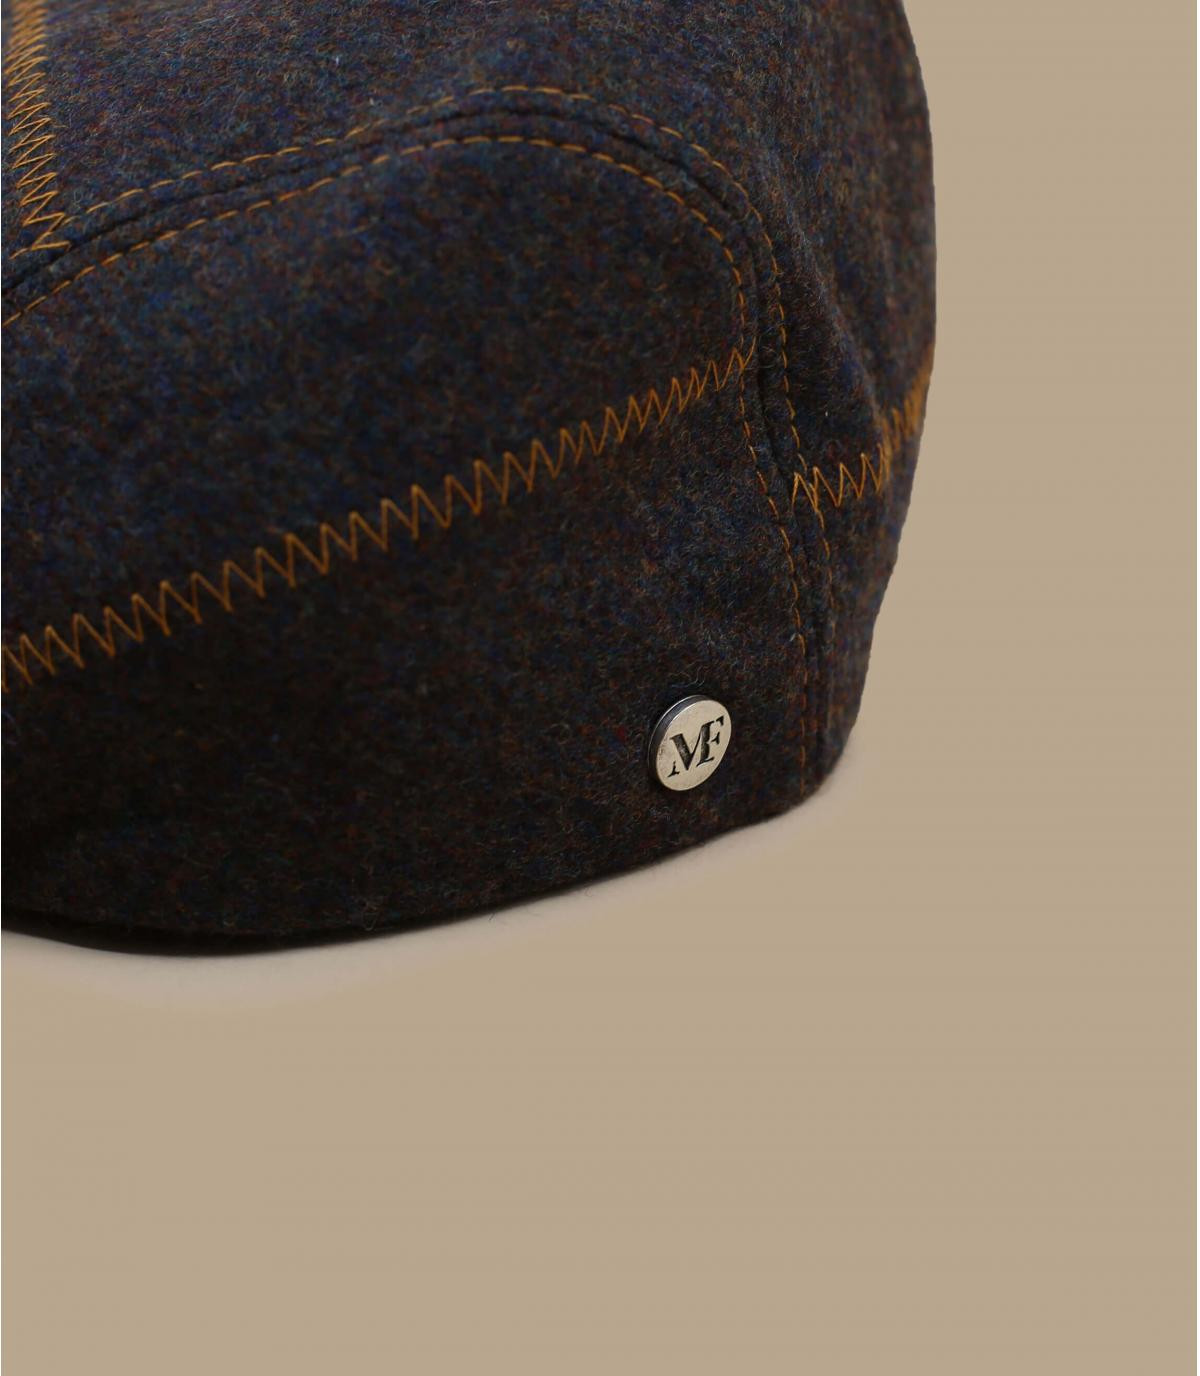 Details Leandre khaki - Abbildung 2